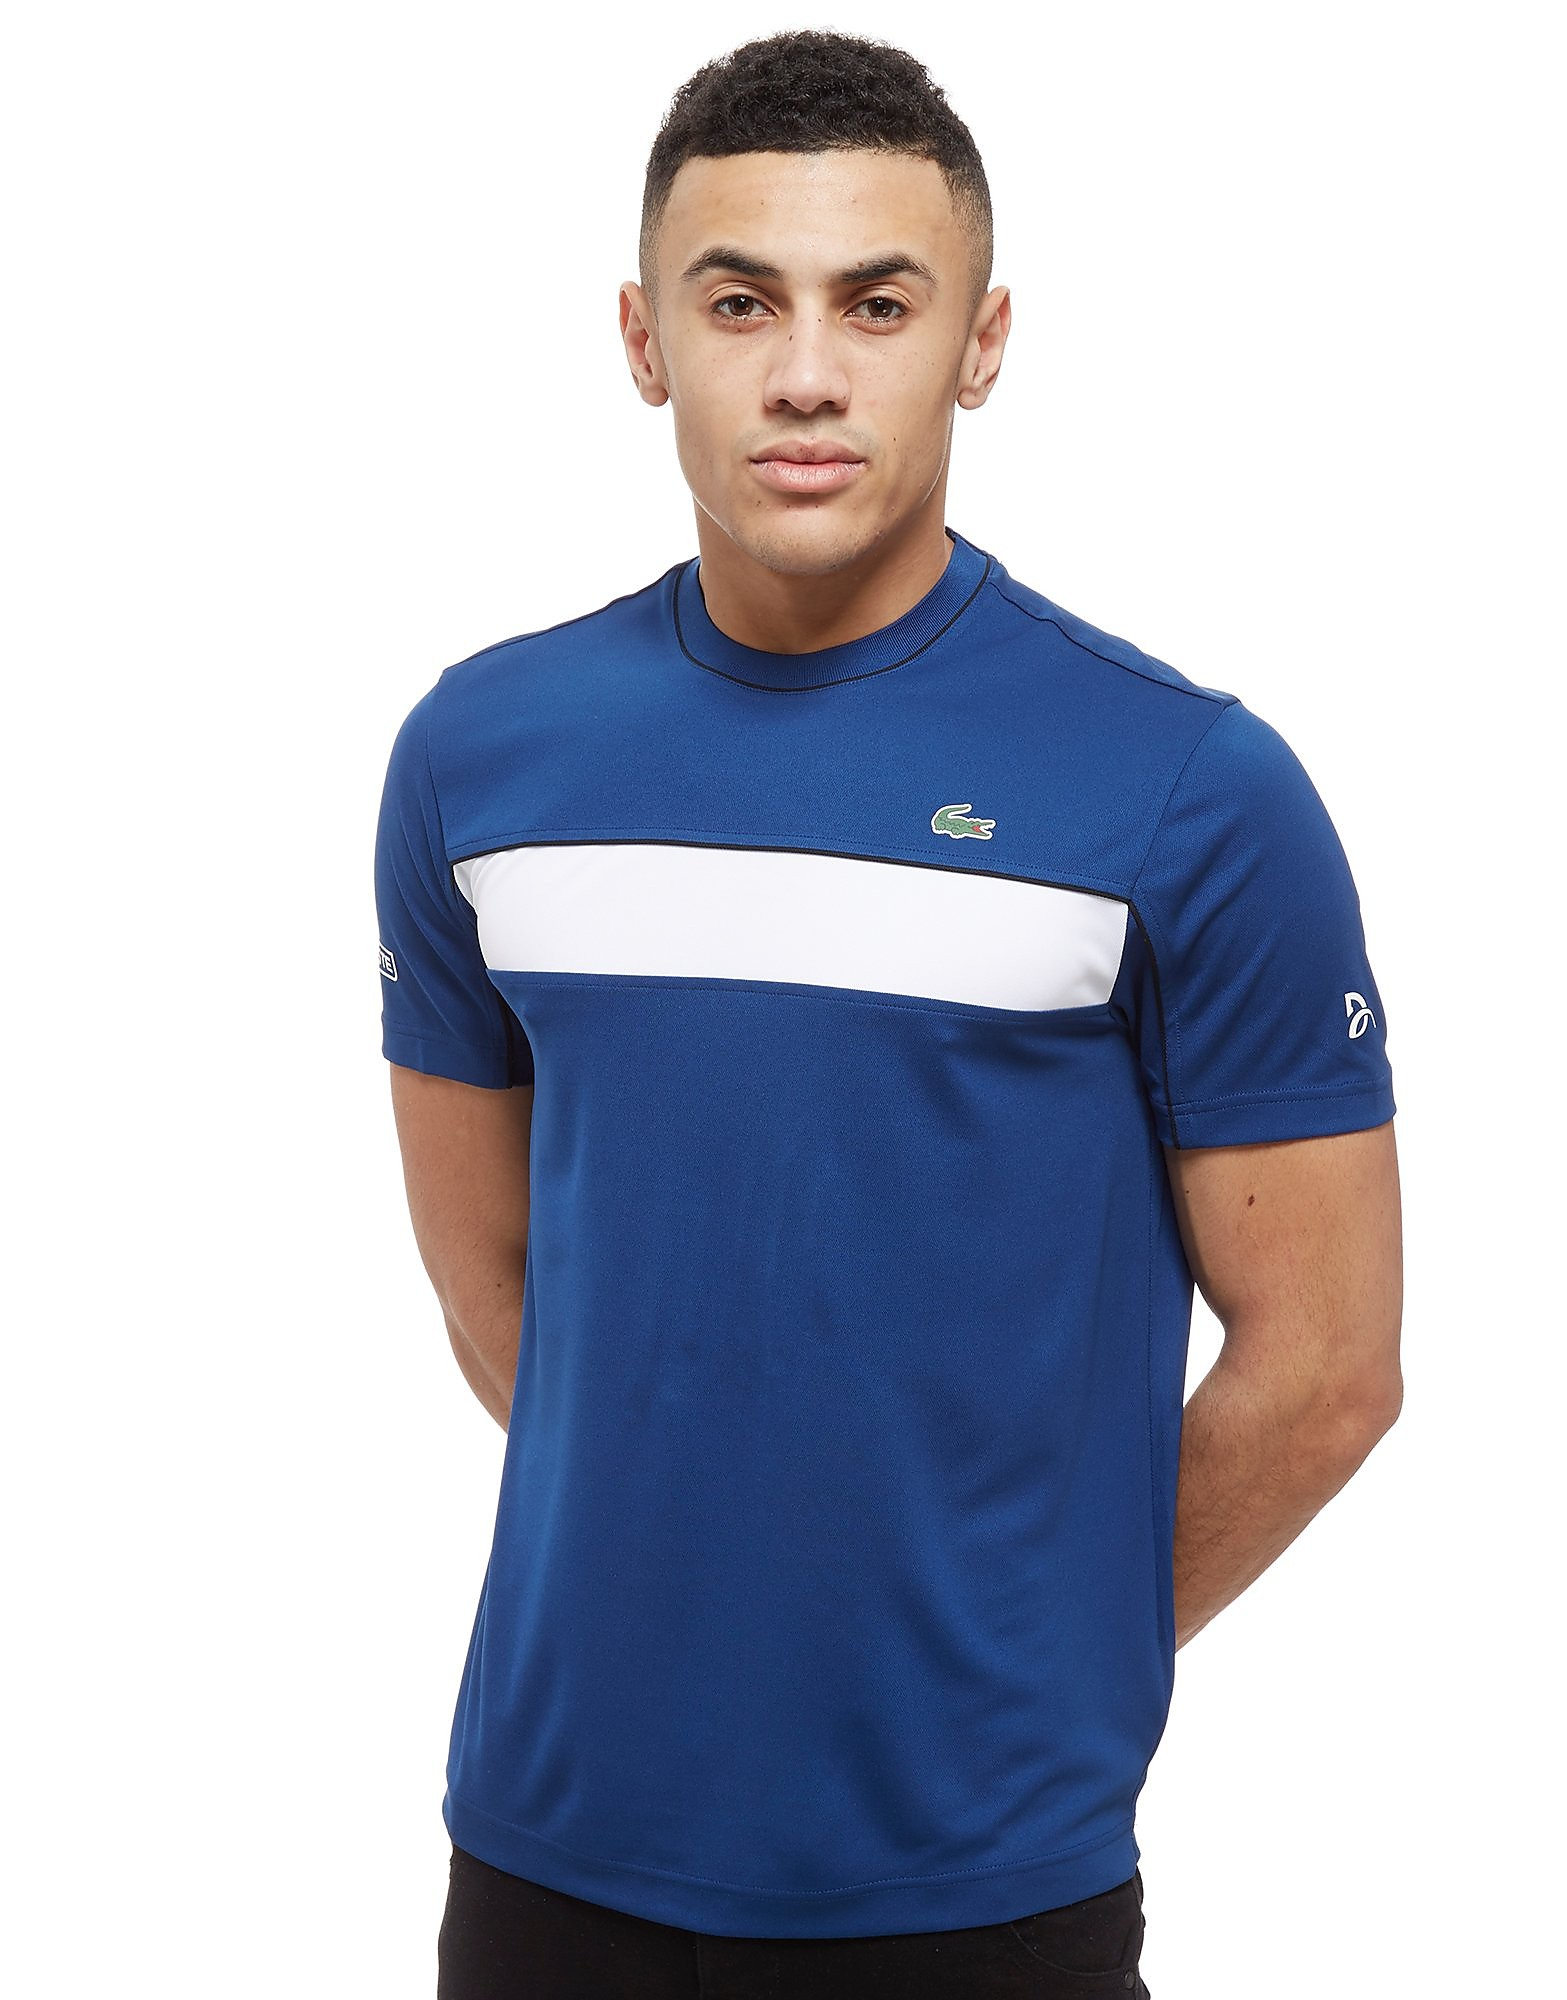 Lacoste T-shirt Djokovic Colourblock Tech Homme